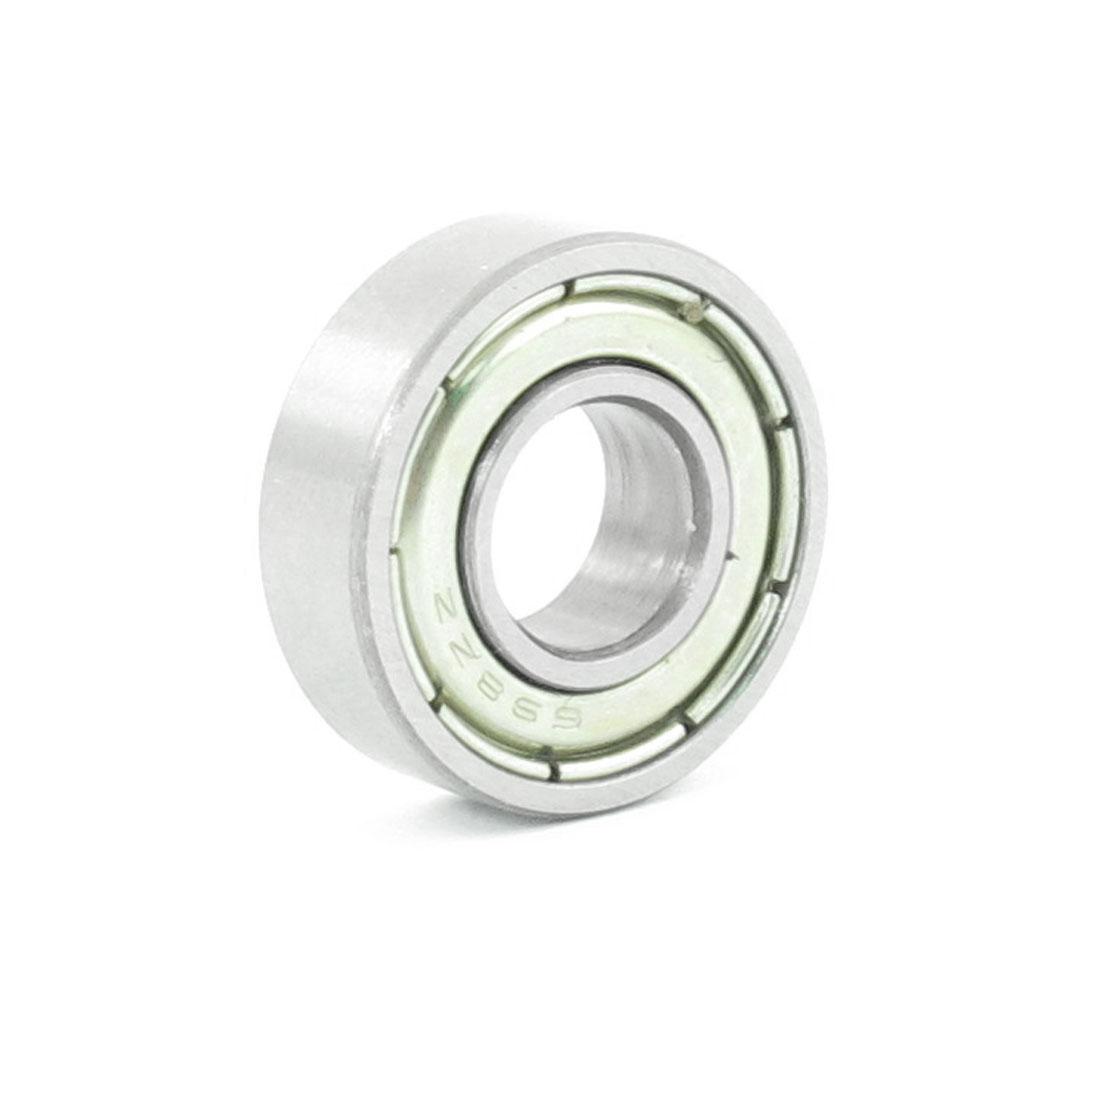 Shielded 8mm x19mm x6mm 6982 Deep Groove Ball Bearing